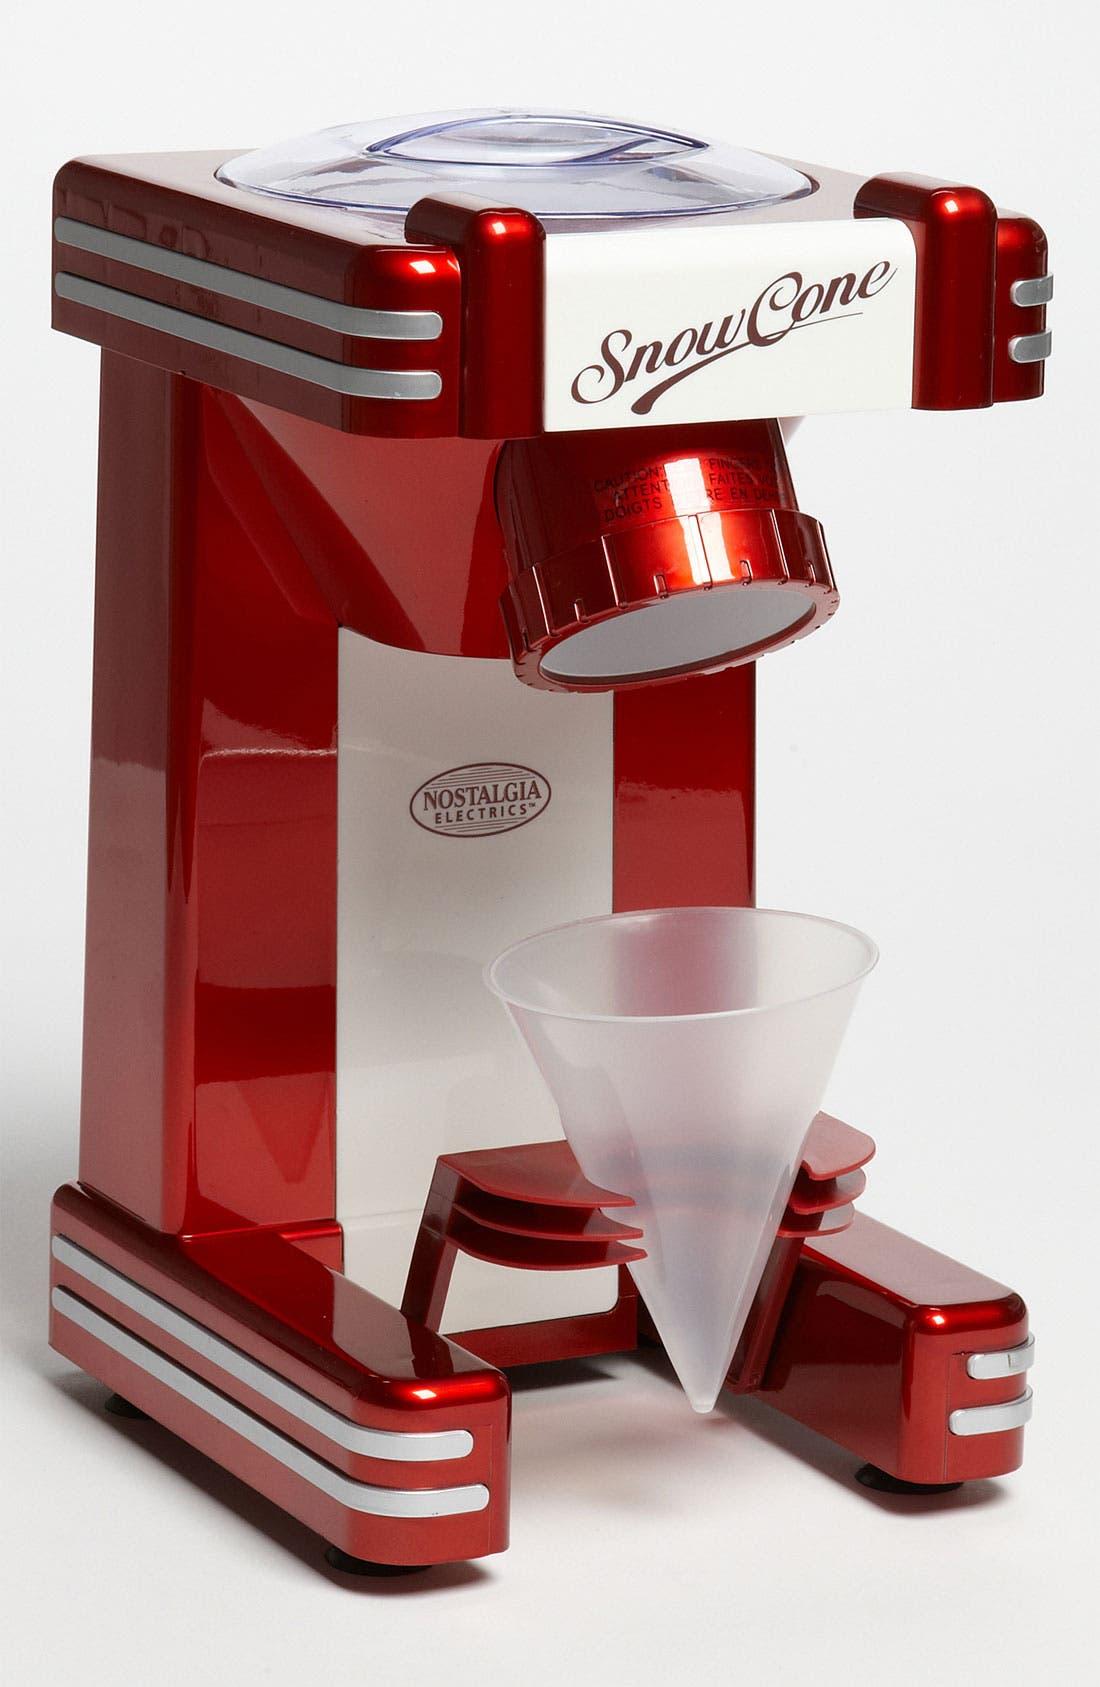 Main Image - 'Retro Series' Single Serve Snow Cone Maker